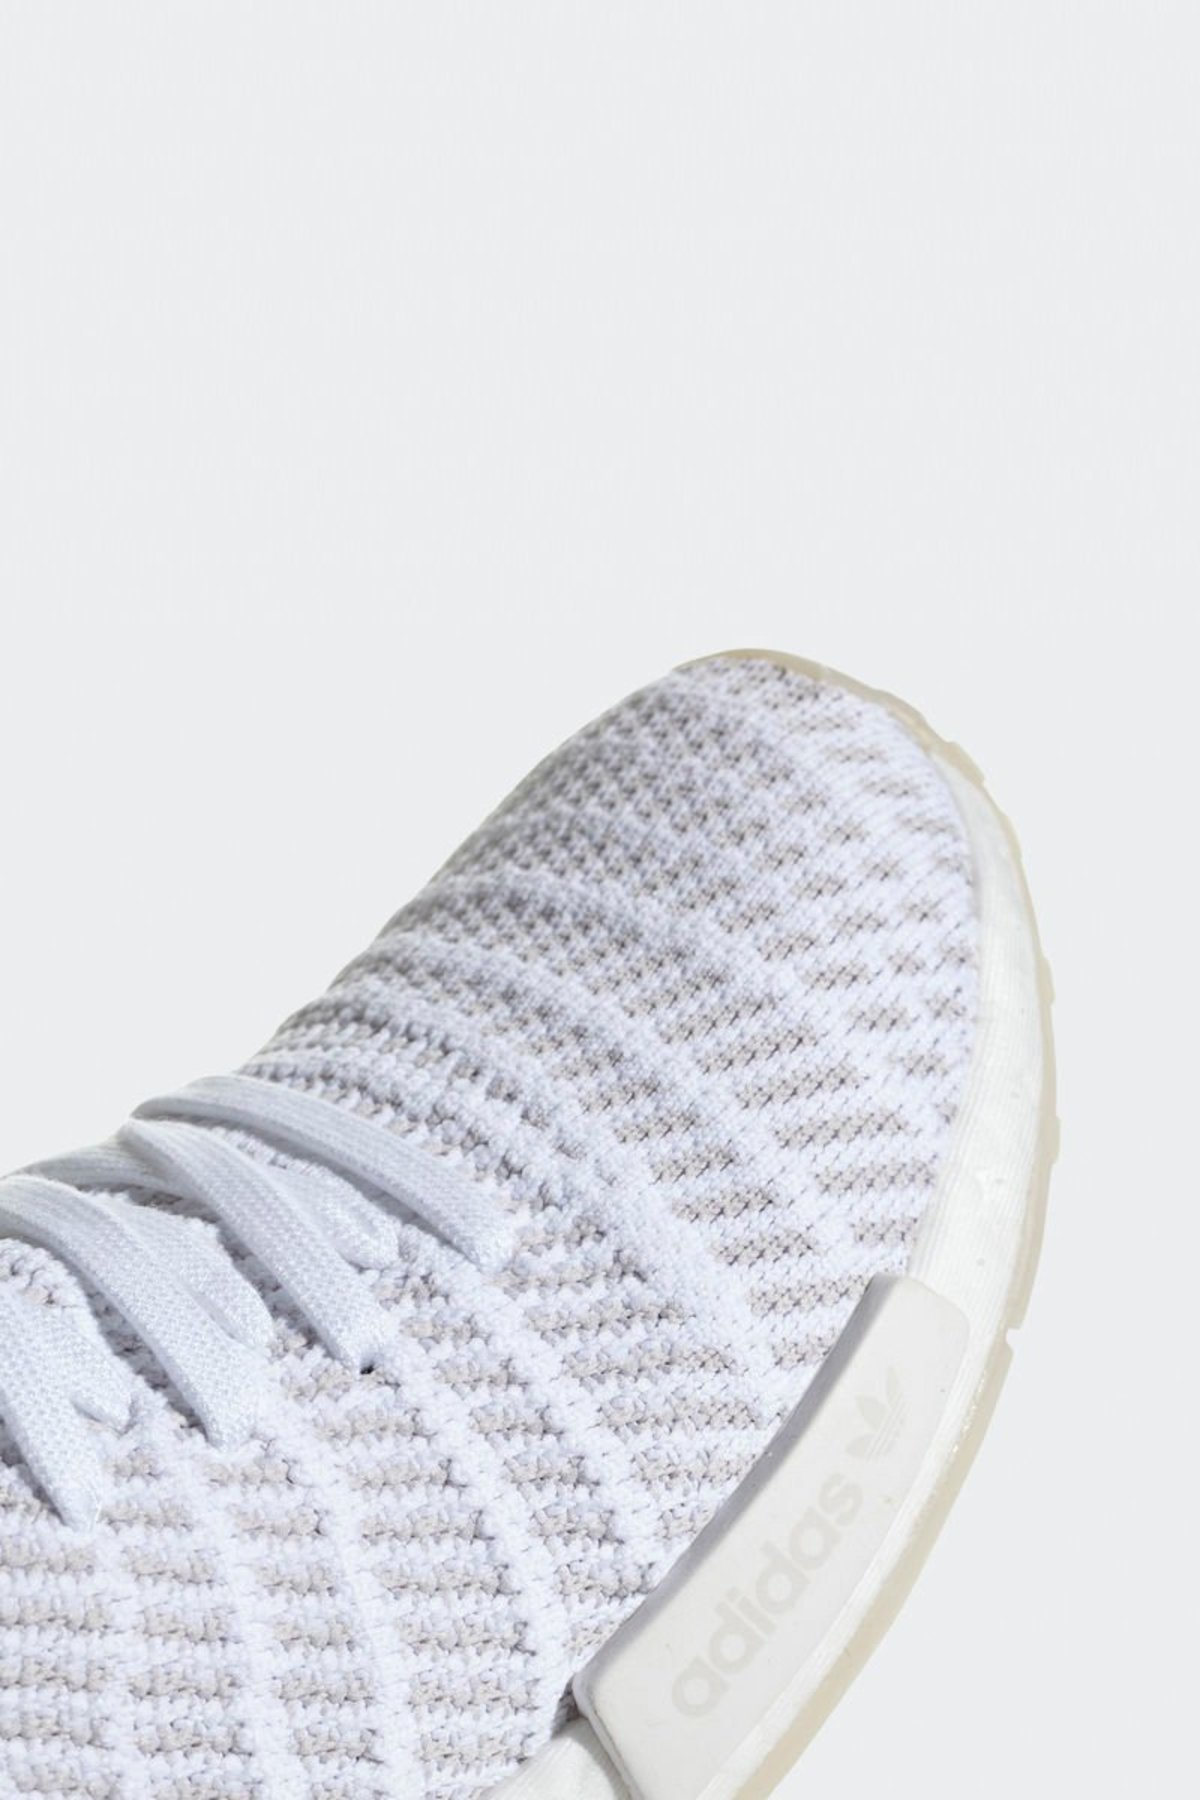 ebb3eafc429 Adidas Originals NMD R1 STLT Primeknit Sneakers - White Grey One ...